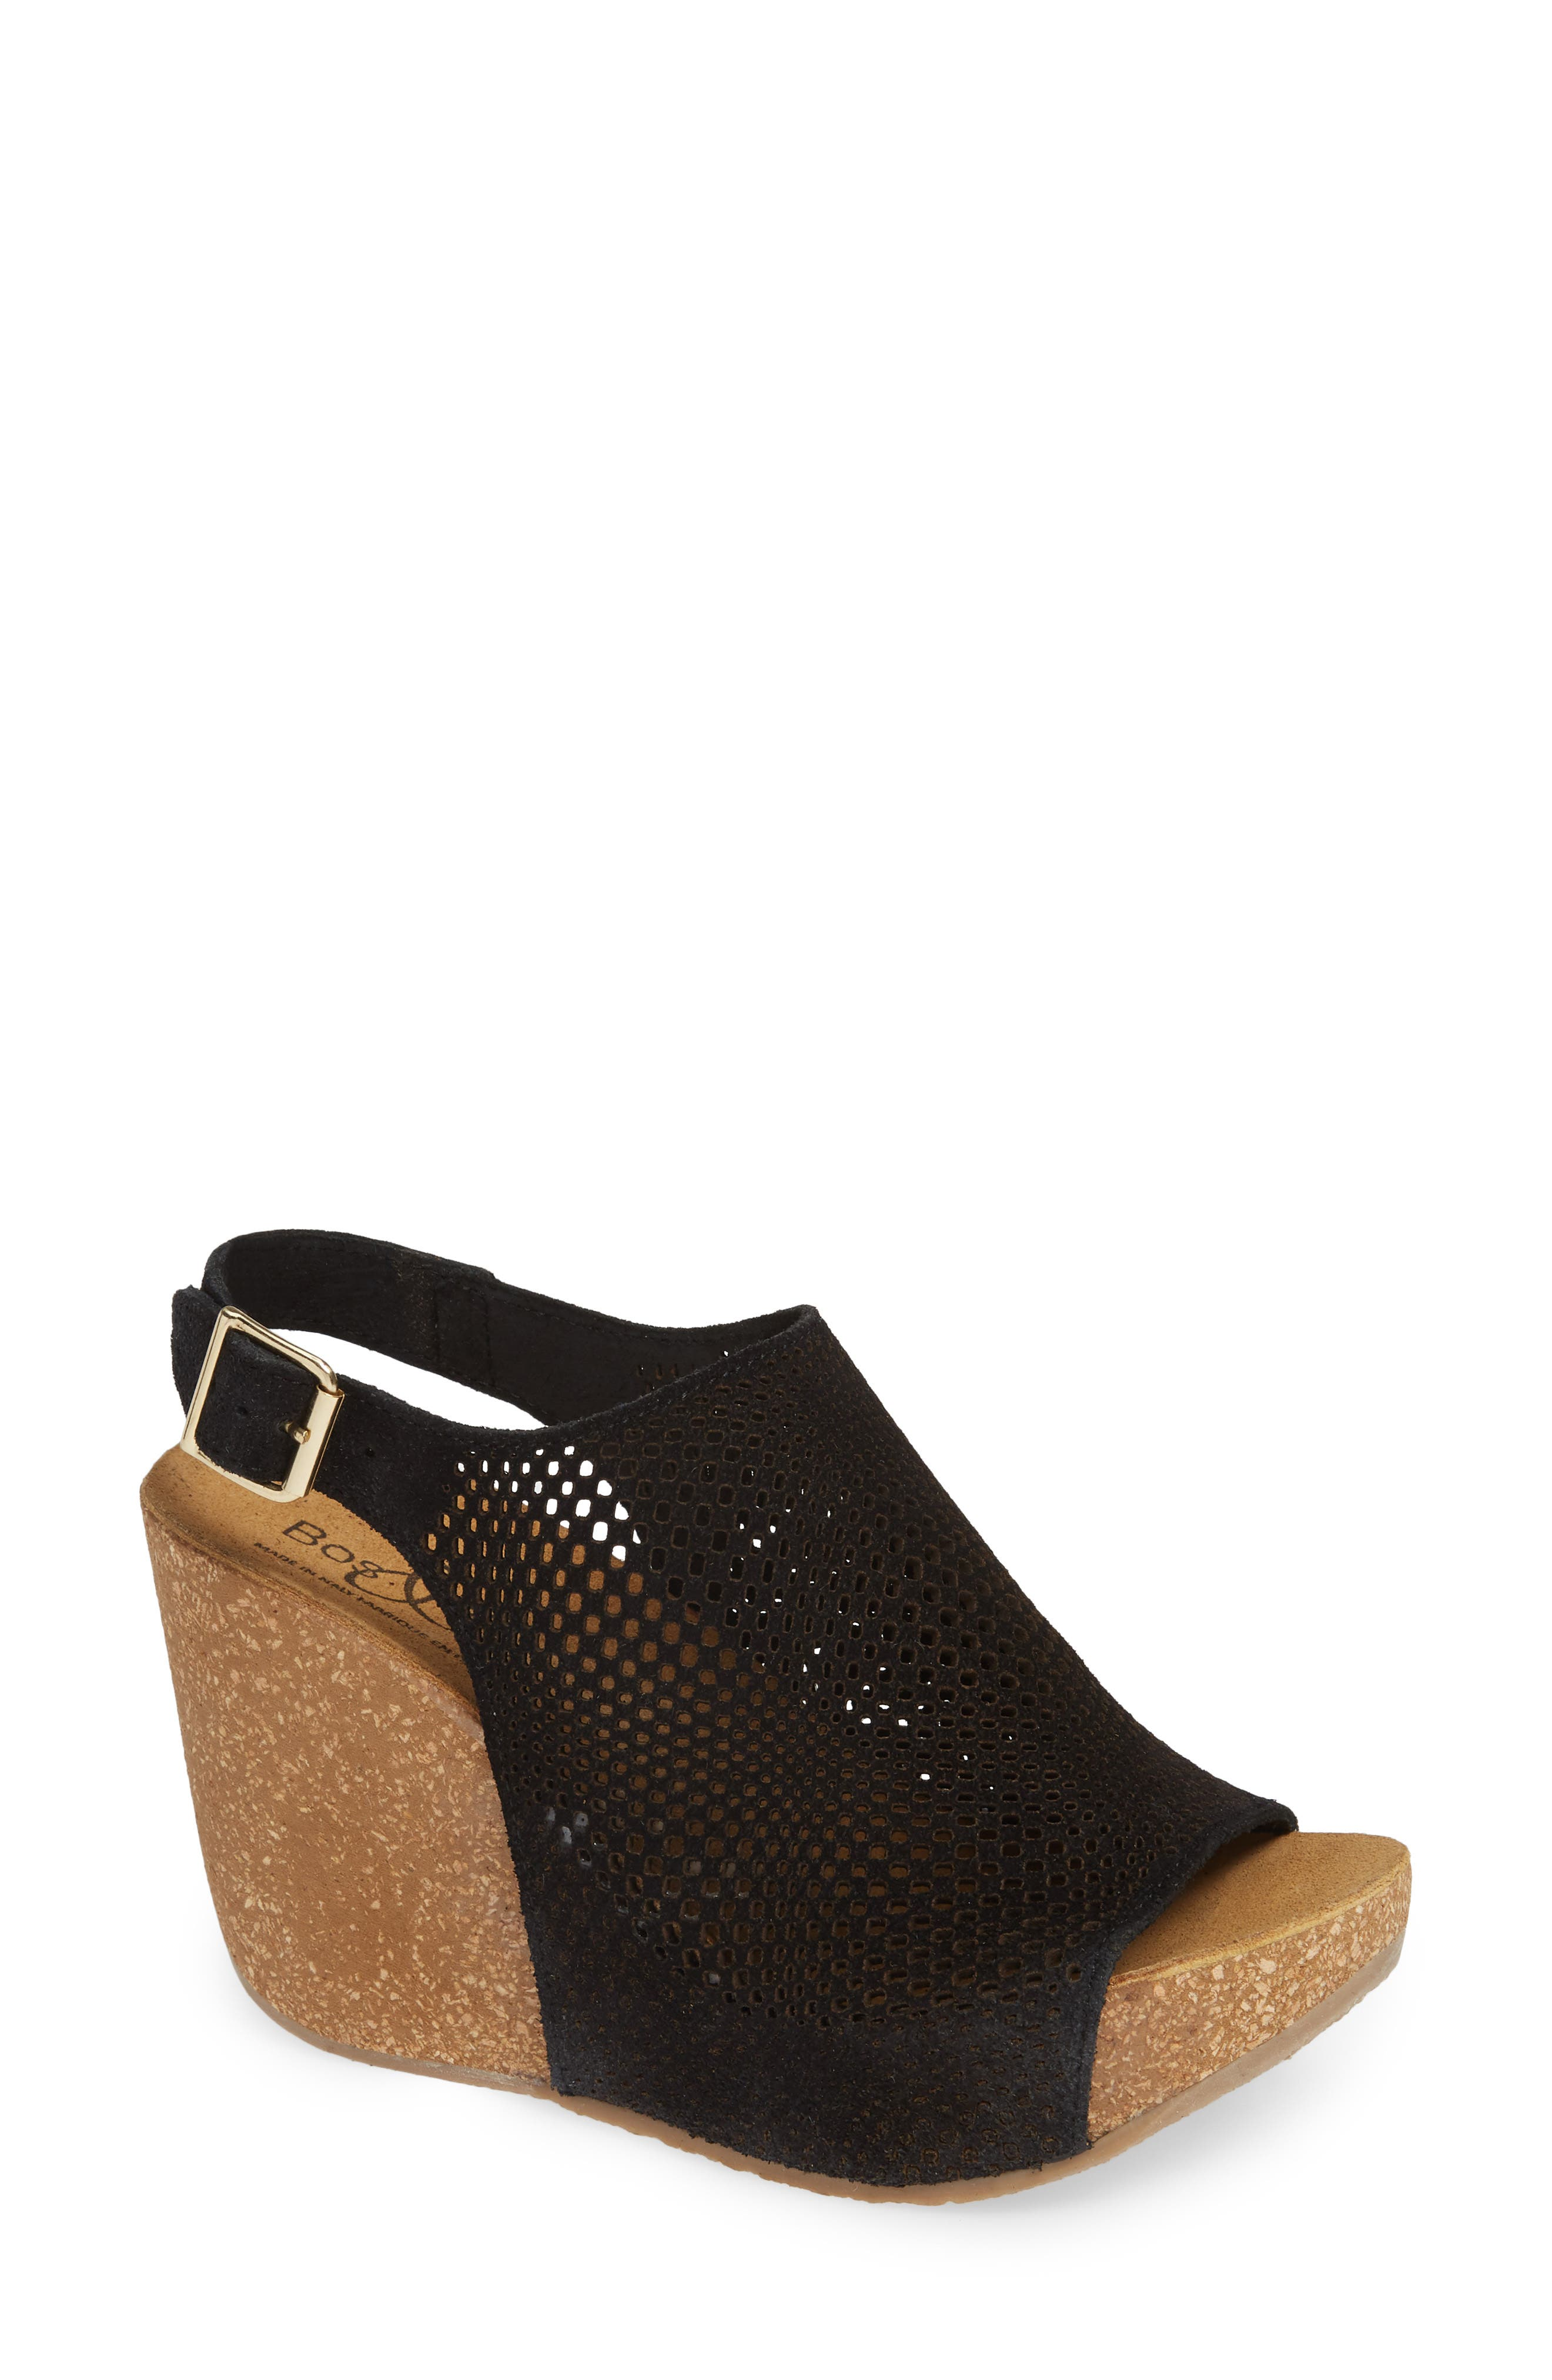 Savona Wedge Sandal, Main, color, BLACK SUEDE